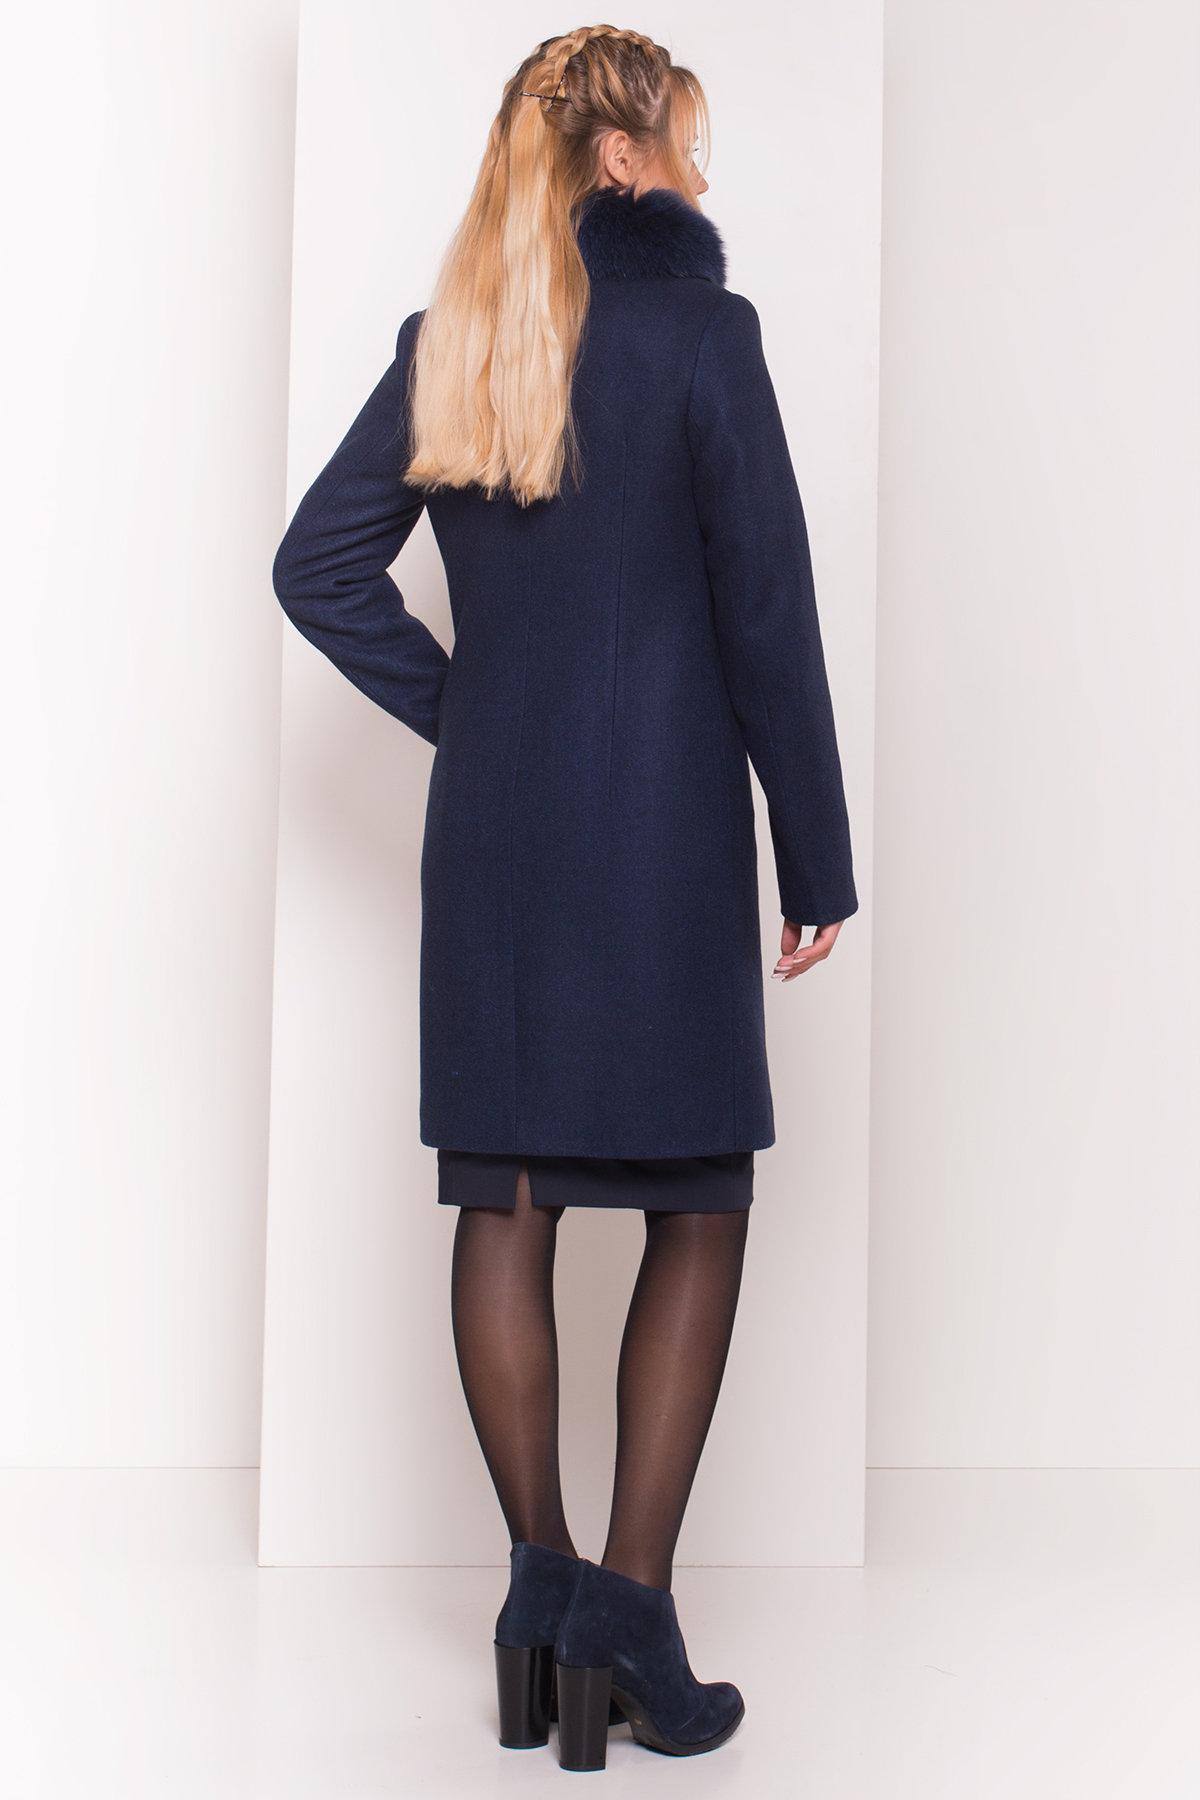 Пальто зима Люцея 5513 АРТ. 37046 Цвет: Темно-синий 17 - фото 2, интернет магазин tm-modus.ru